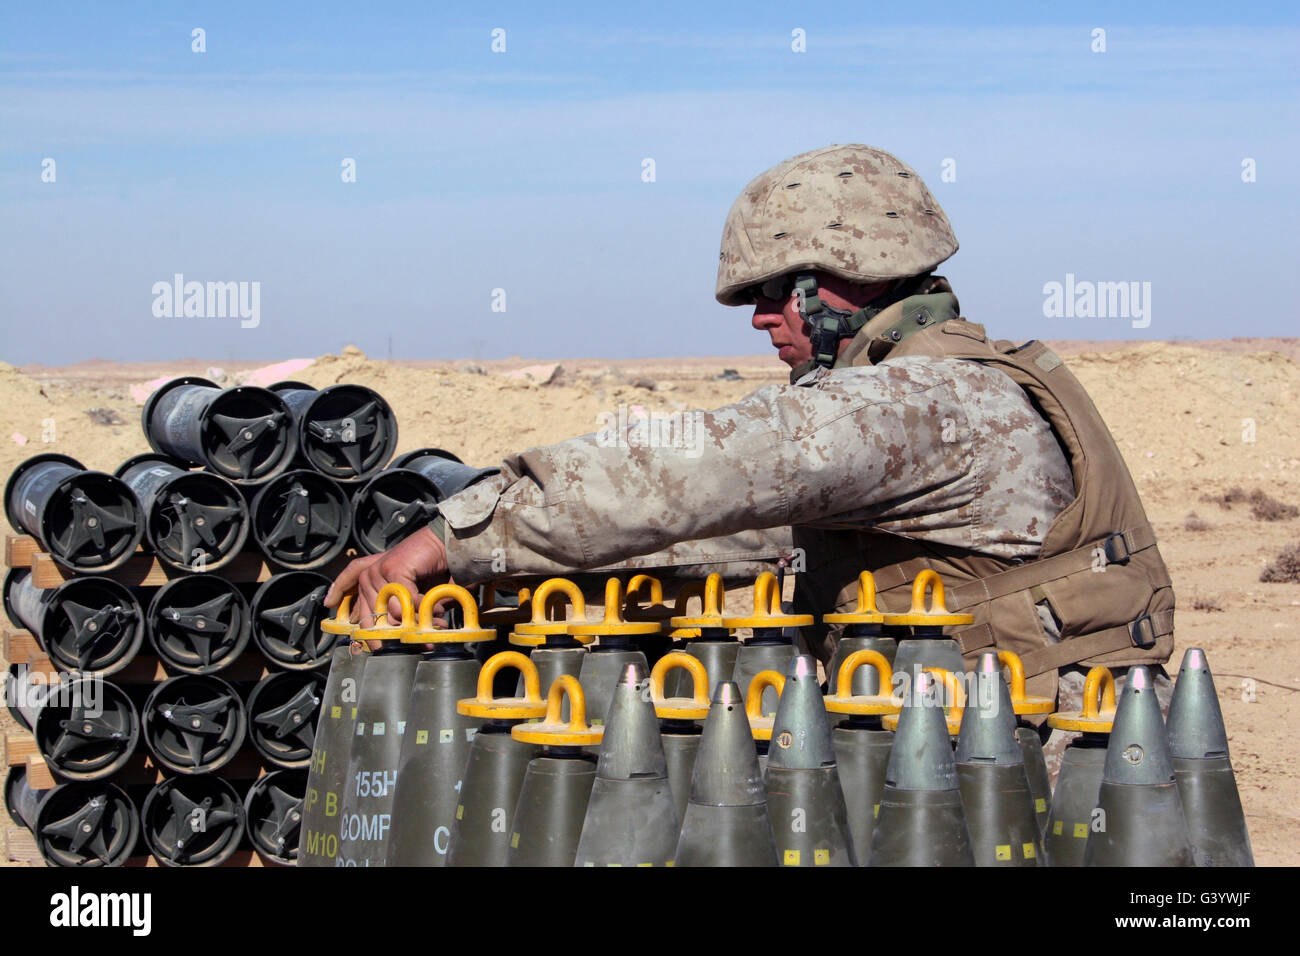 Ammunition team prepares 155 mm high-explosive artillery rounds. - Stock Image